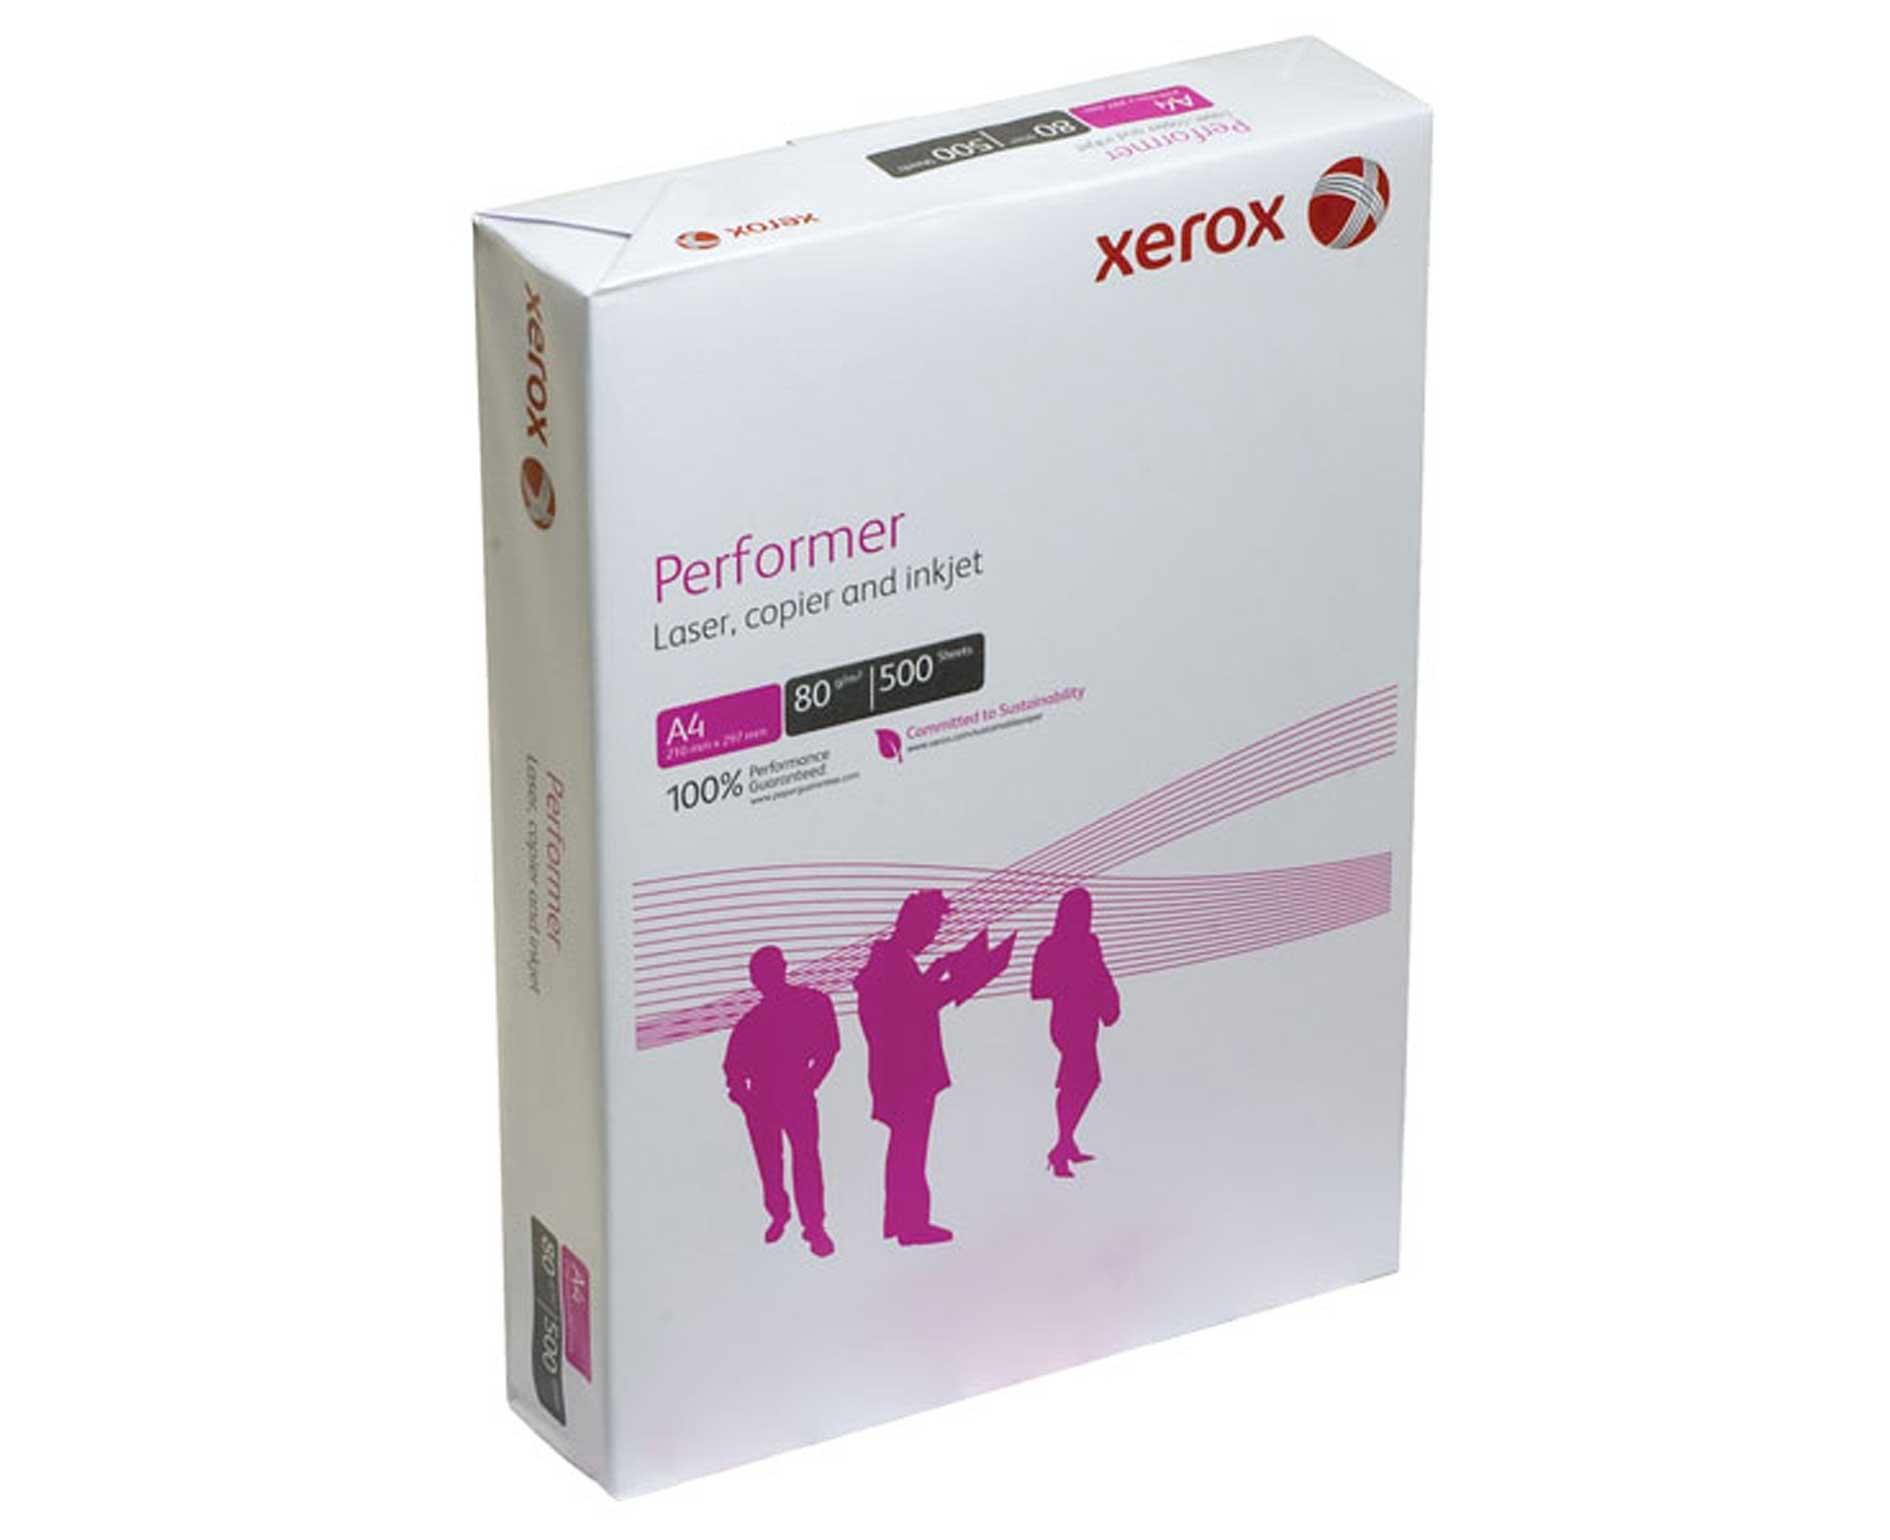 Бумага Xerox Performer класс С, A4, 500 листов - 500 л, 80г/м2, 297x210 (A4) 003R90649